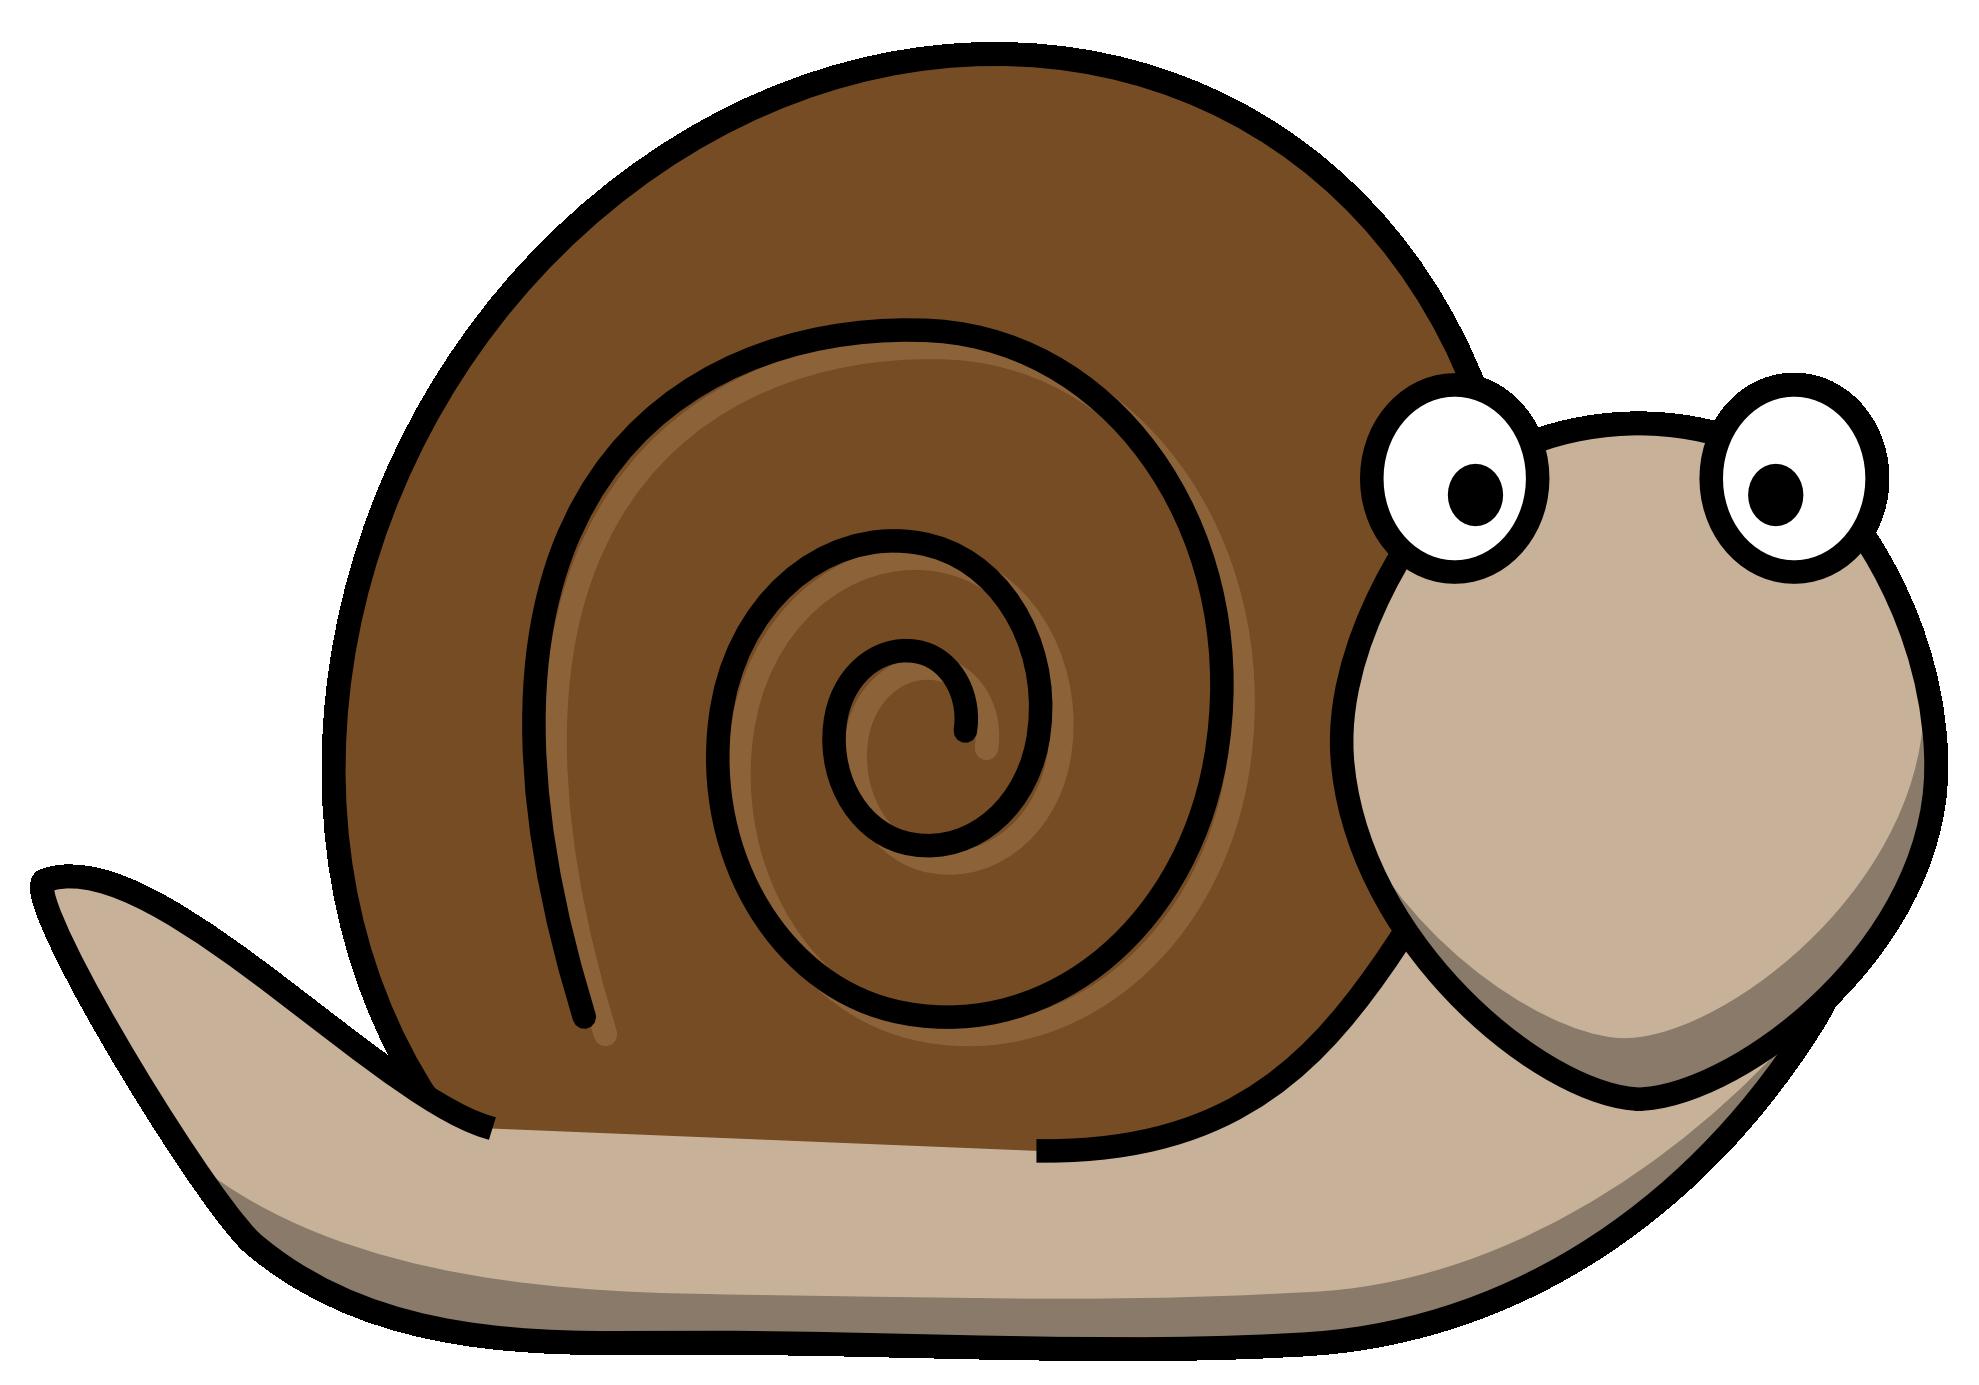 Snail clipart cartoon clipart library library Snail Clipart Free | Free download best Snail Clipart Free ... clipart library library